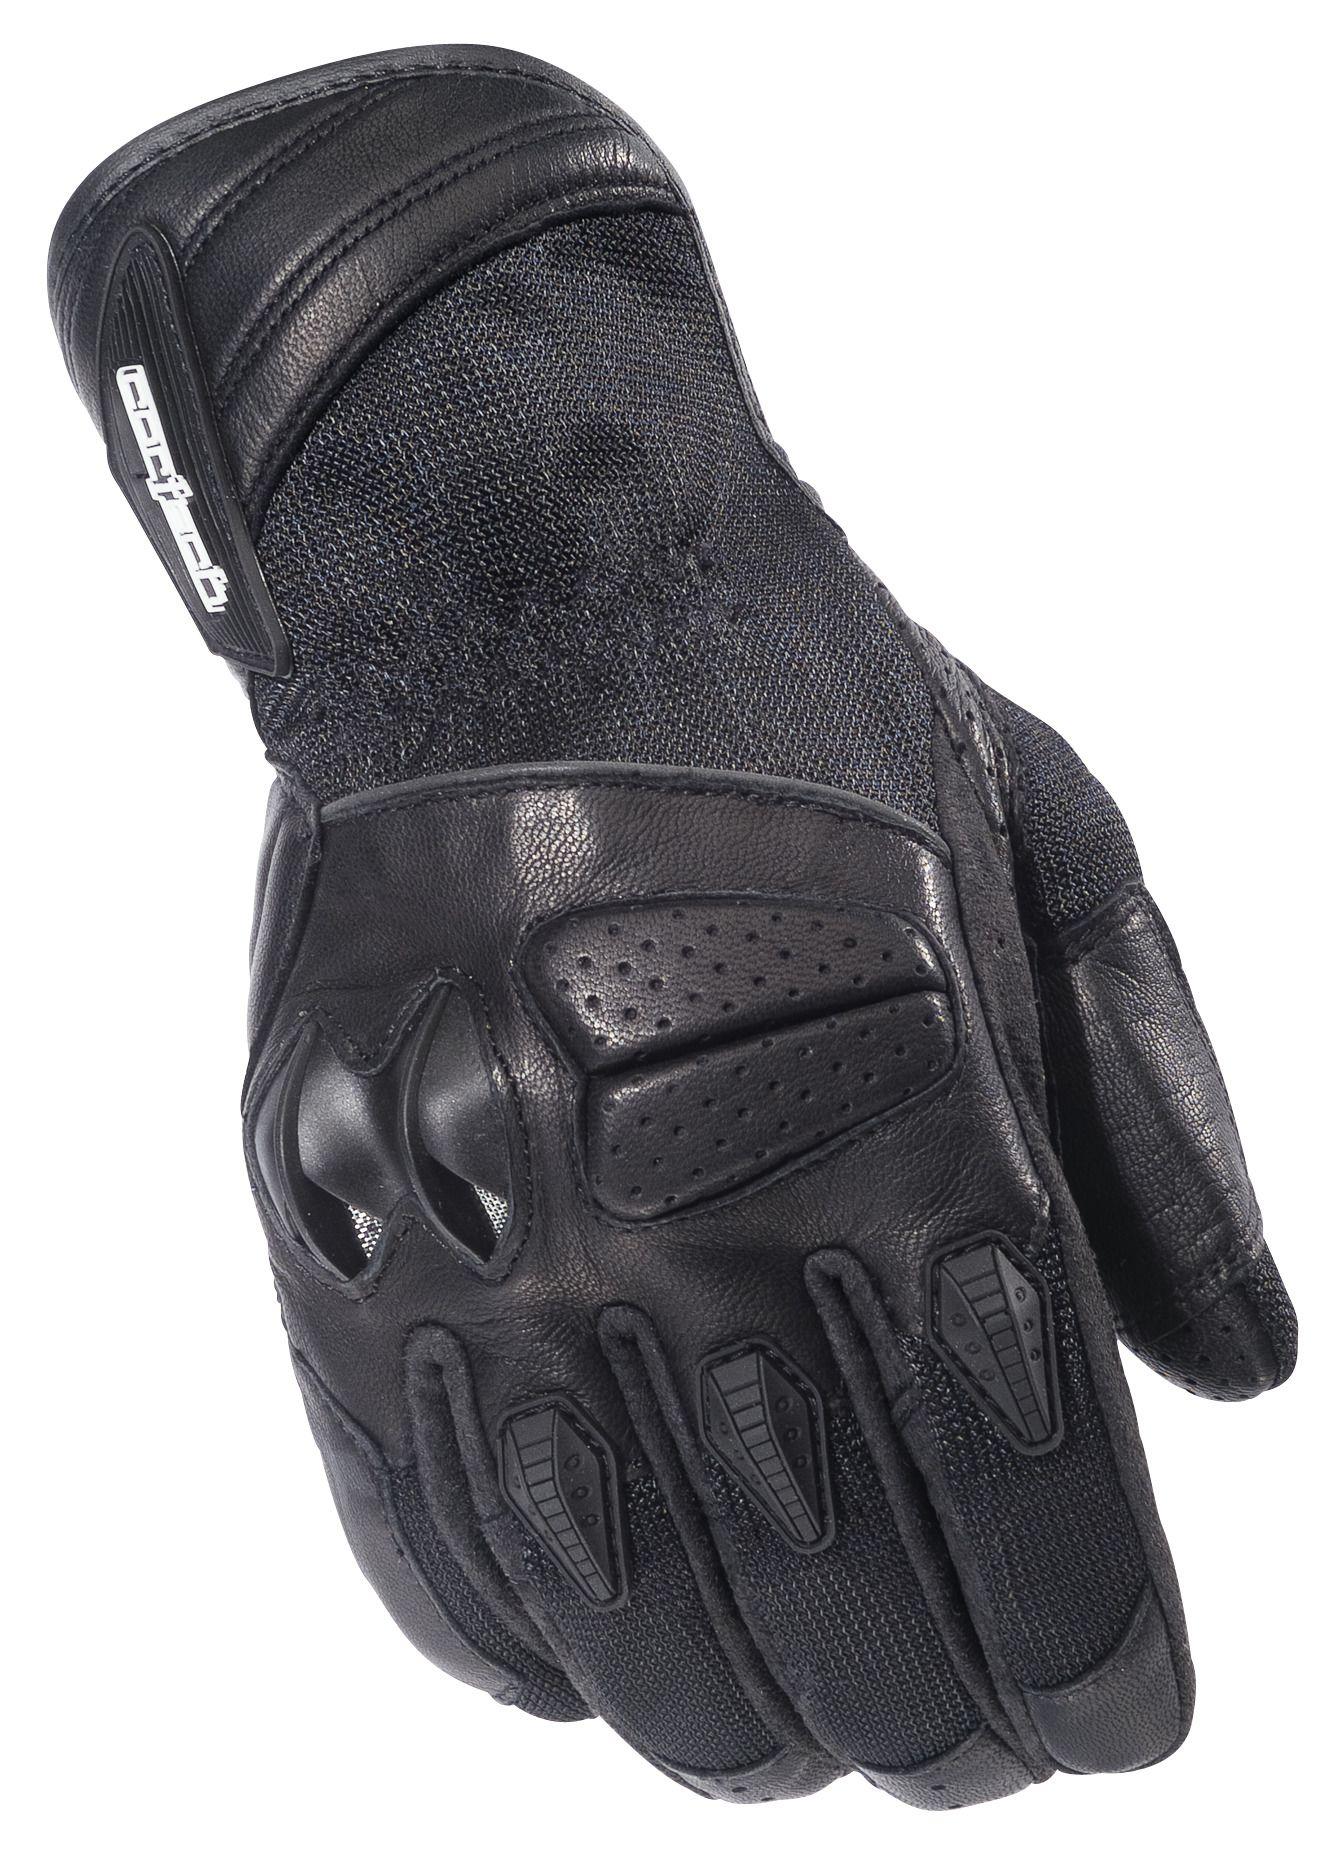 Motorcycle gloves xl - Motorcycle Gloves Xl 47